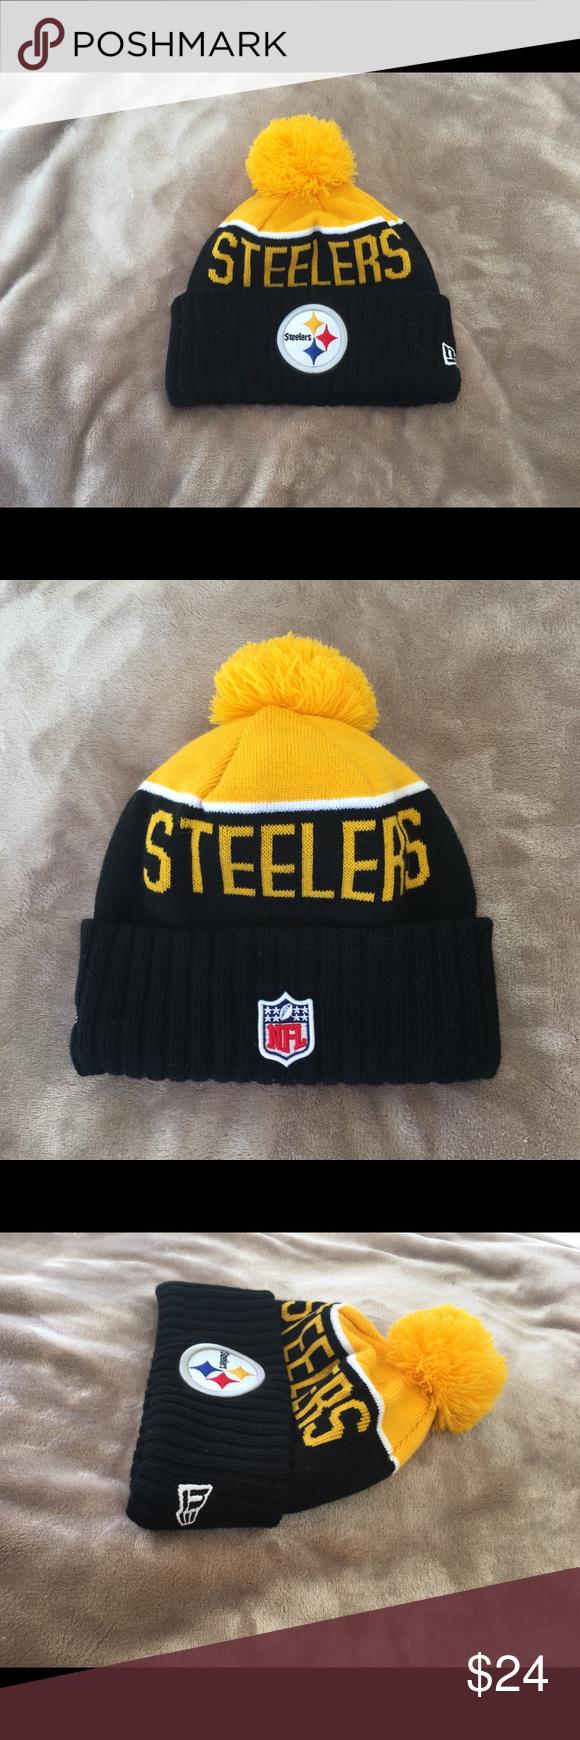 9f106319450 NFL Pittsburgh Steelers Winter Hat NFL Pittsburgh Steelers unisex winter  beanie   ski hat. Never worn